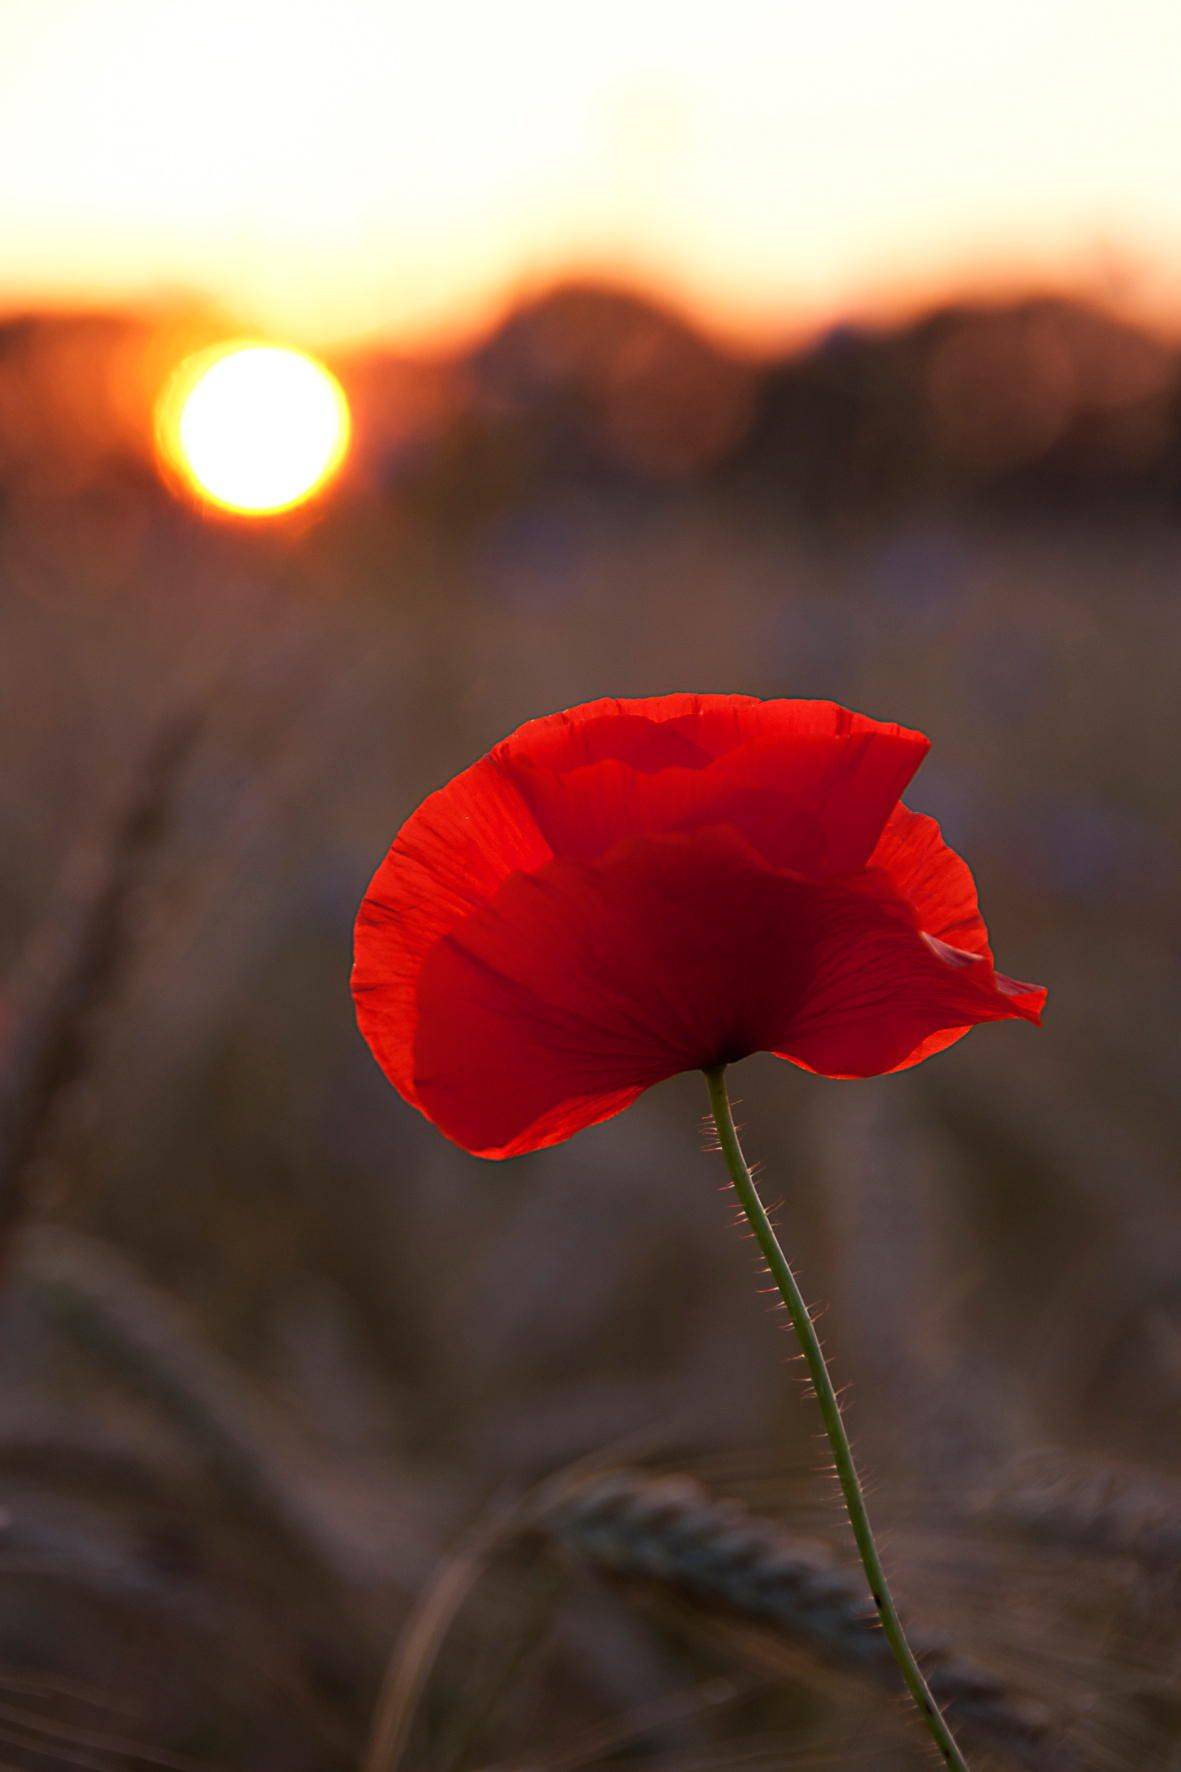 Poppy 2 By Irene Van Nunen On 500px Blumen Mohnblume Bilder